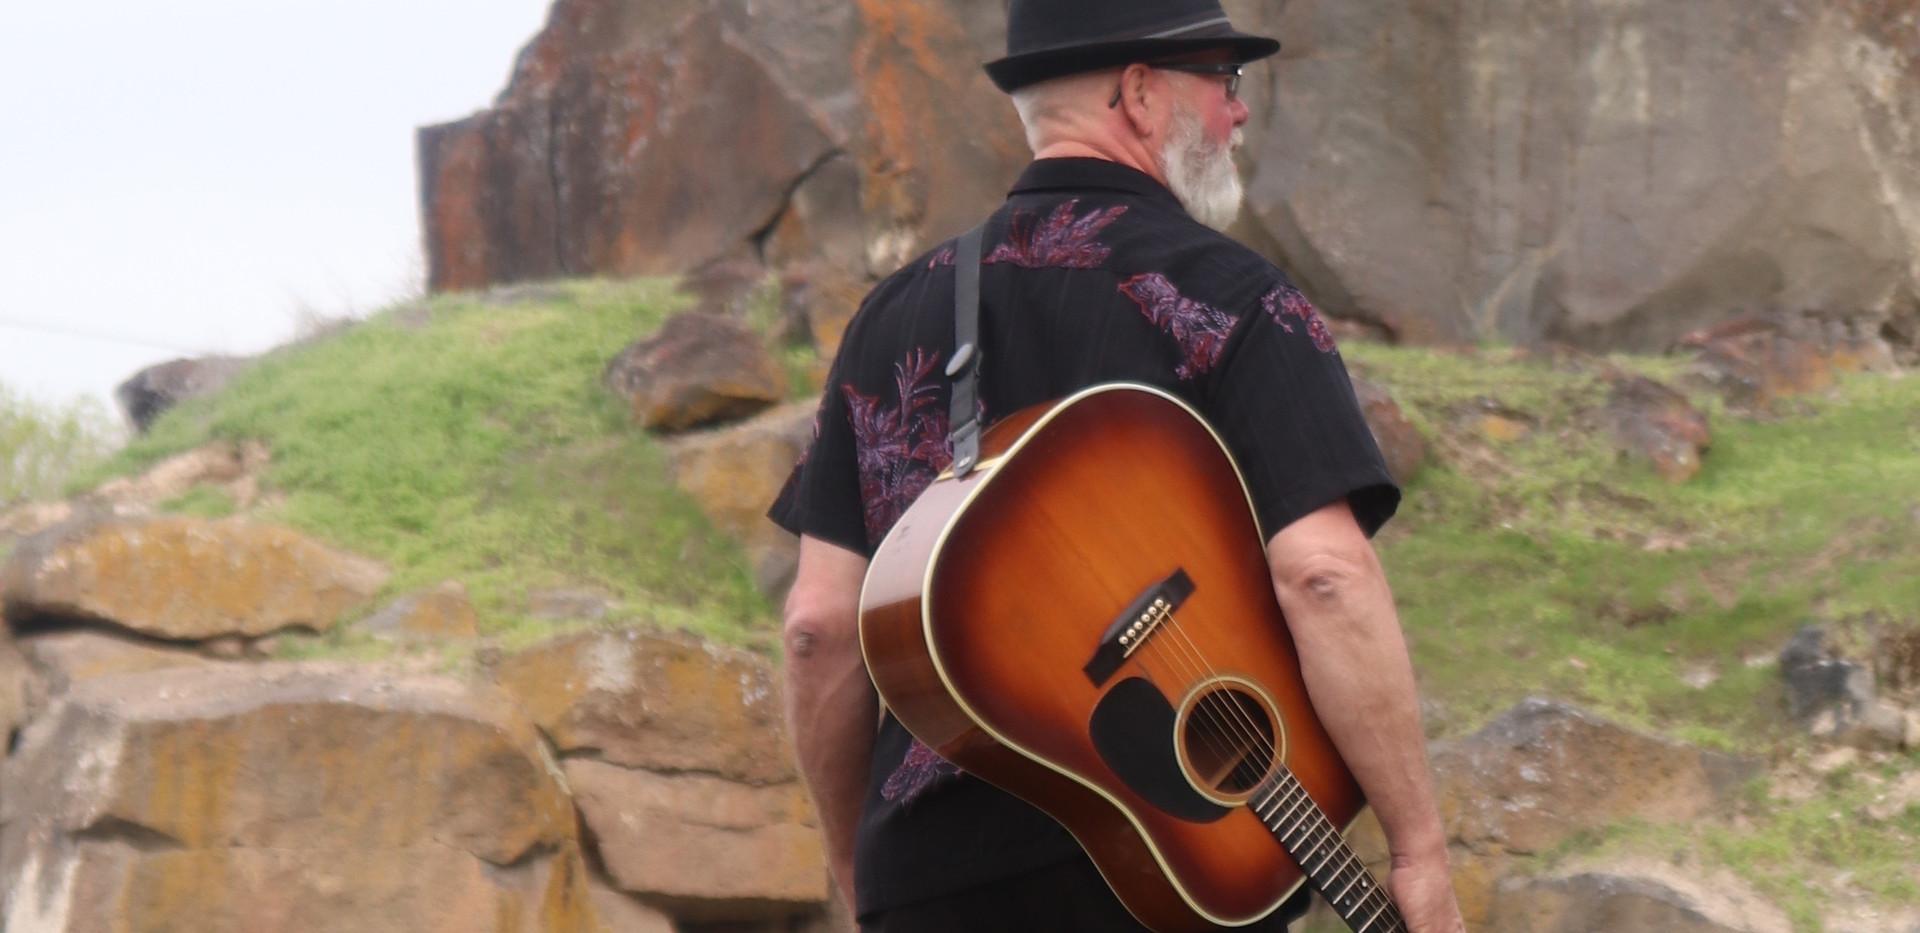 bill w banjo and guitar.jpg